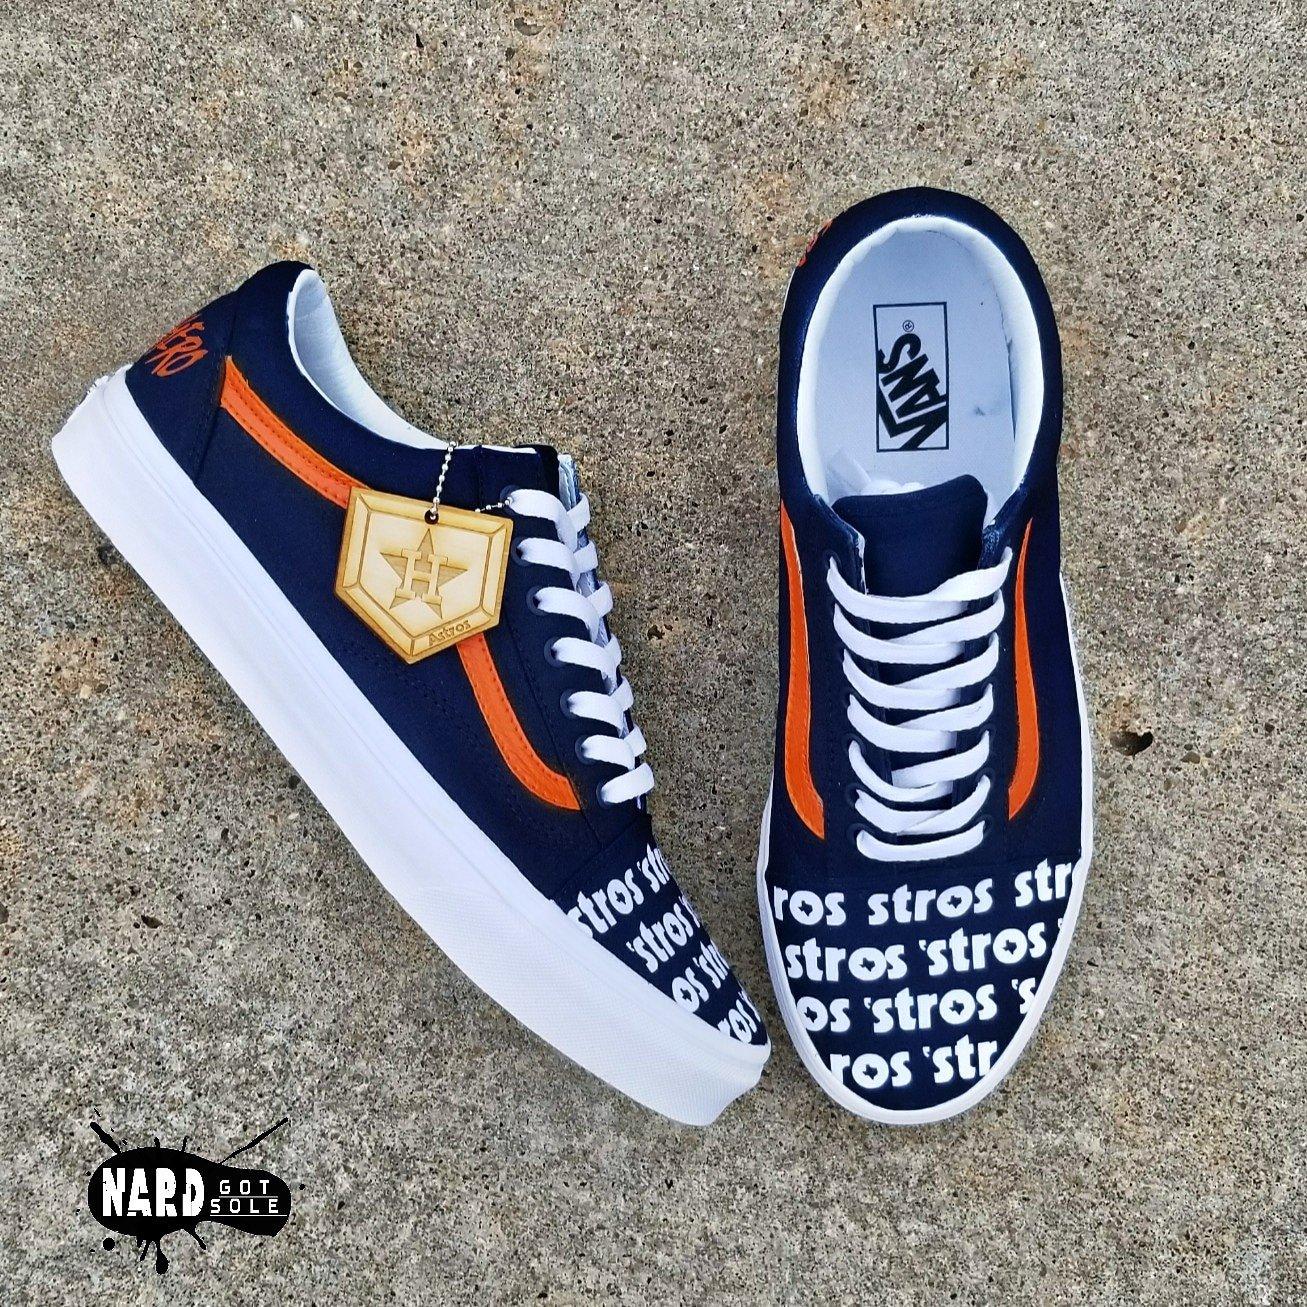 Custom 'Stros Vans | Nard Got Sole Customs